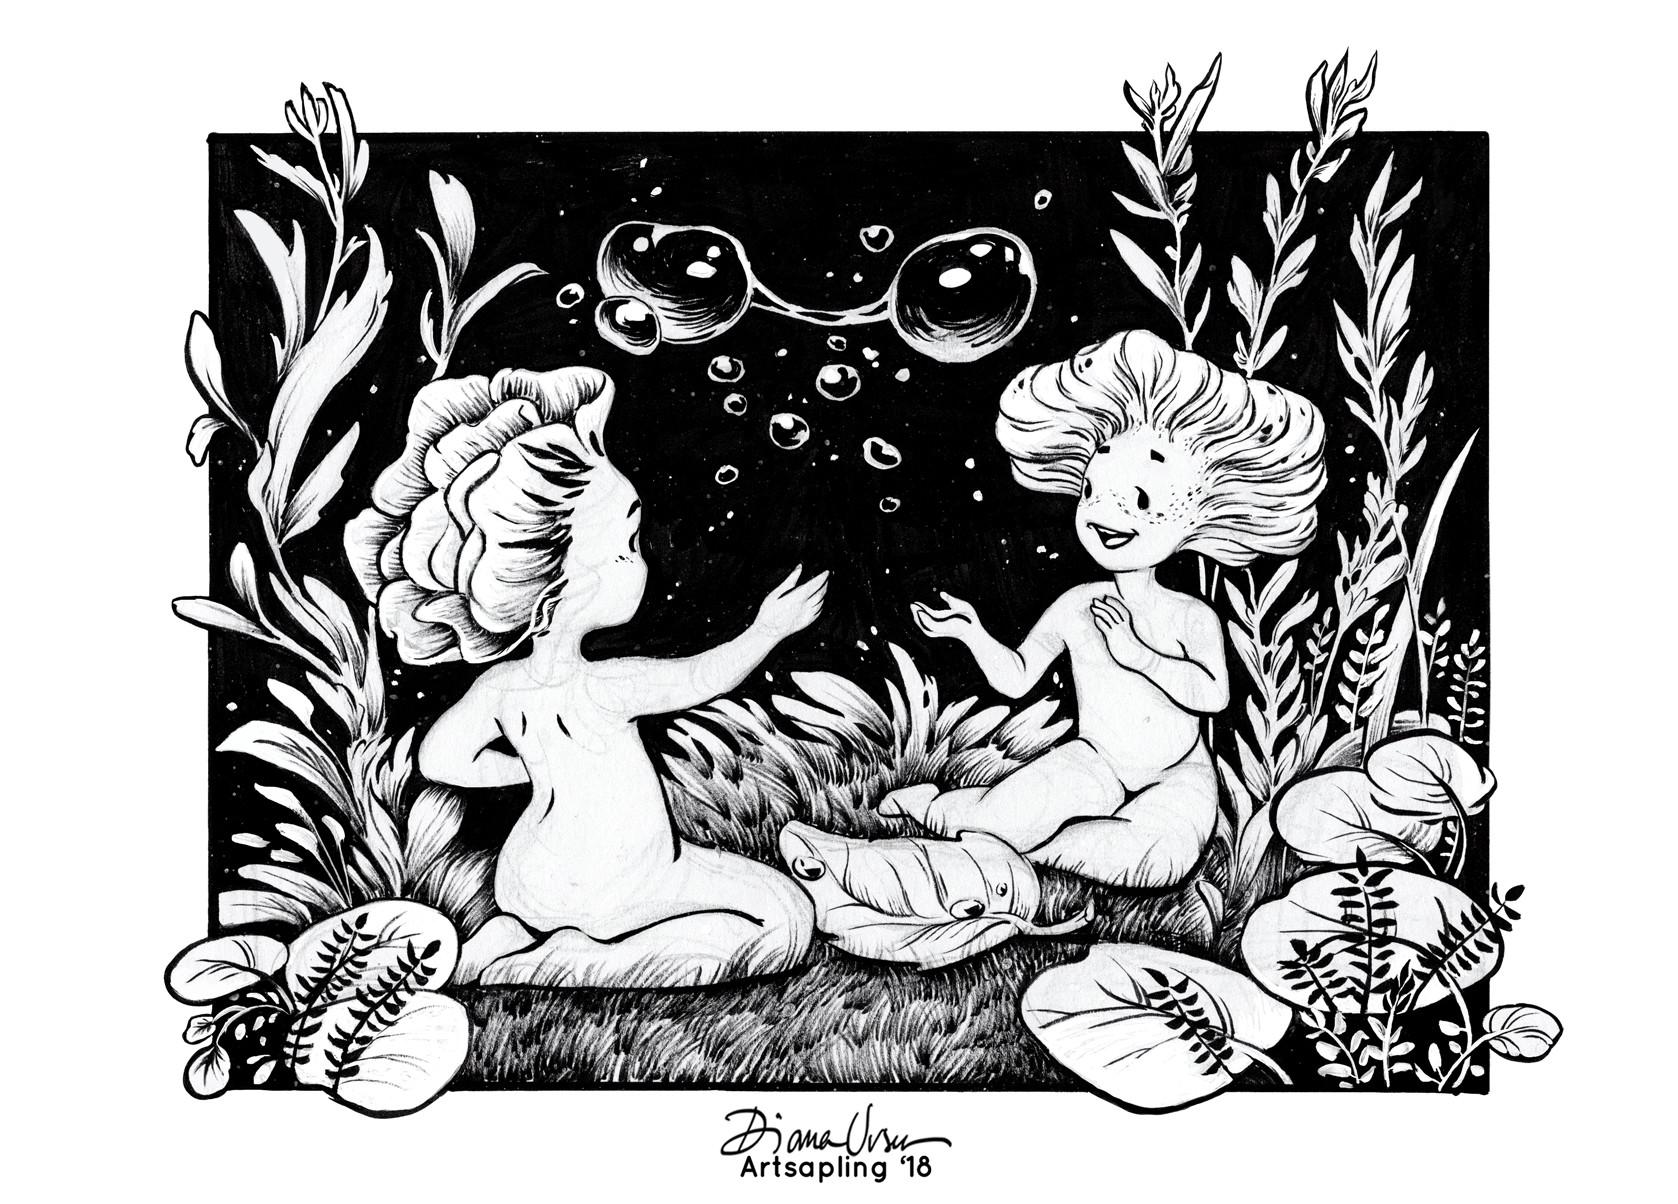 Diana ursu leaf spo ink by artsapling